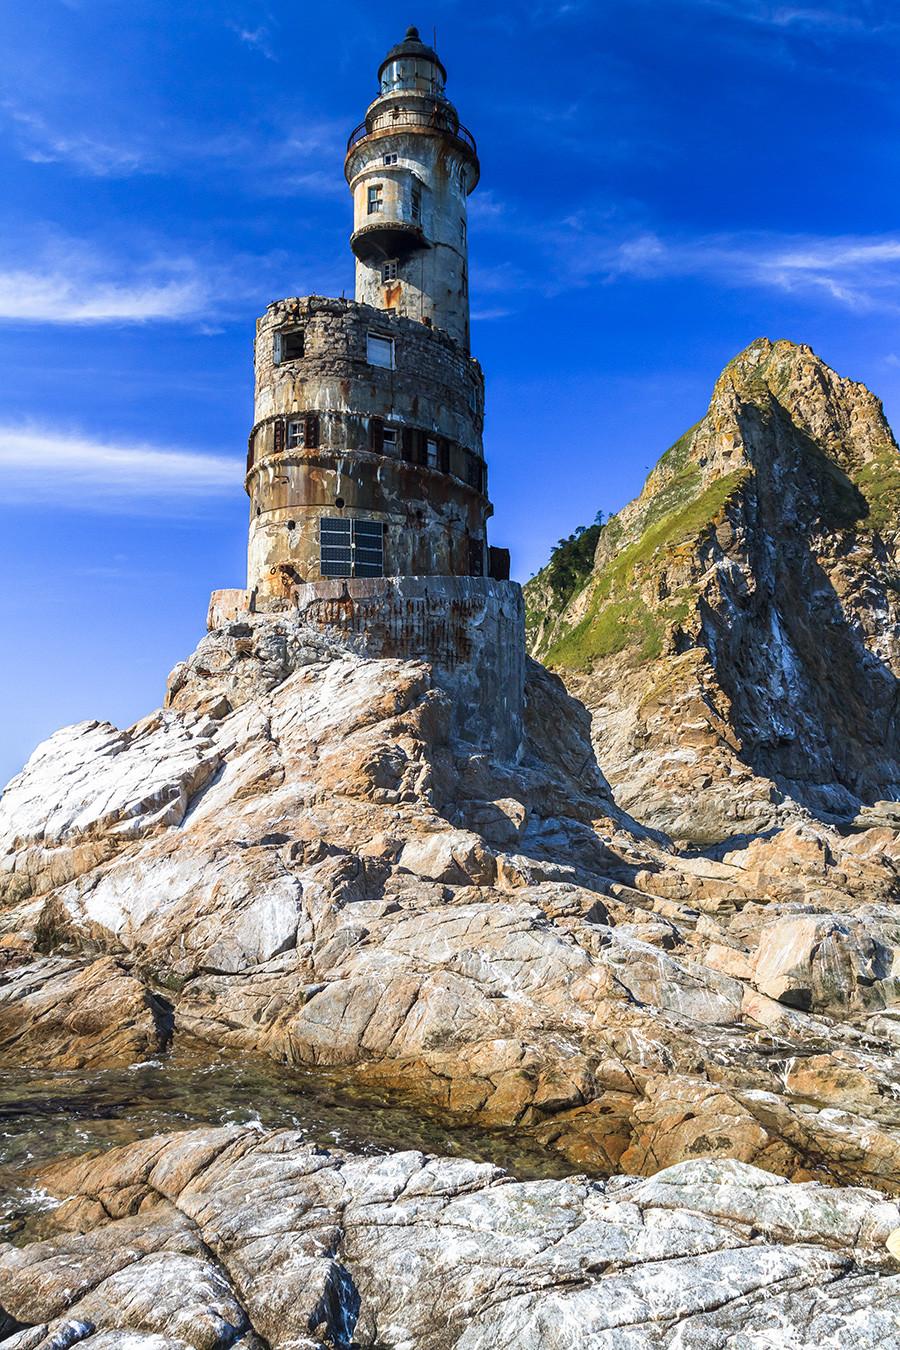 Alter Leuchtturm, Aniwa Kap, Insel Sachalin, Russland.